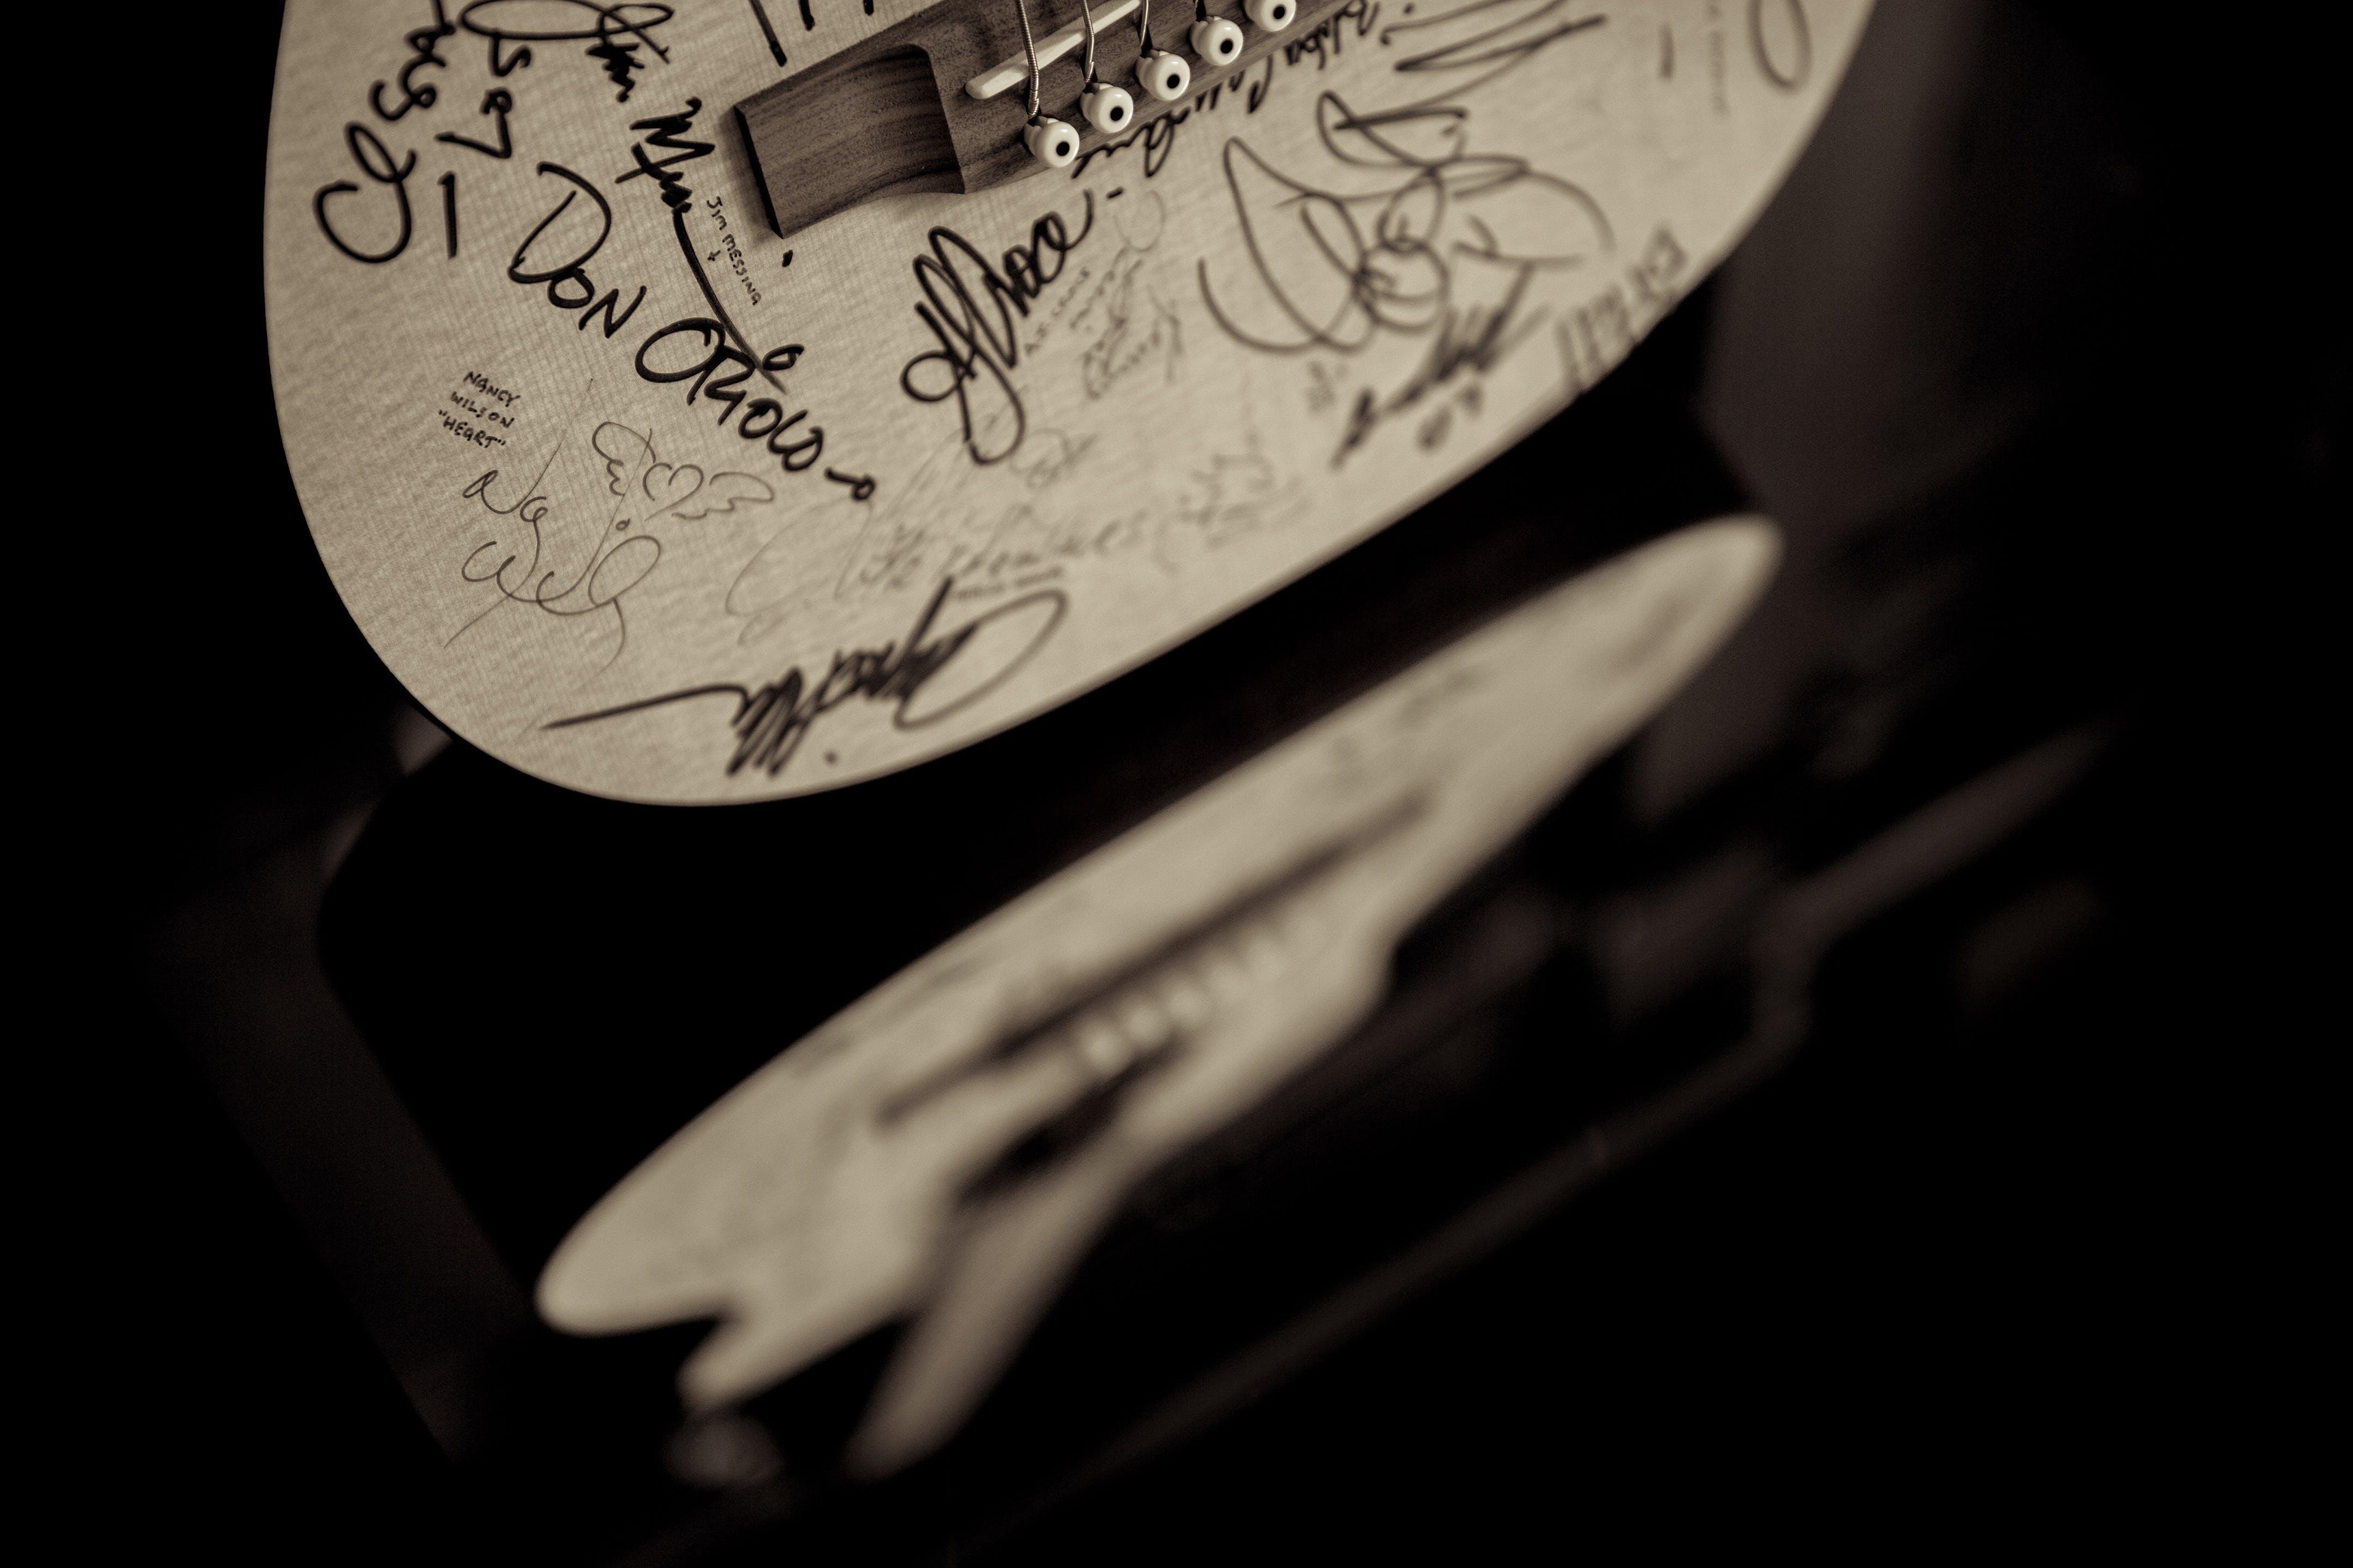 of acoustic guitar, autograph, dark, guitar